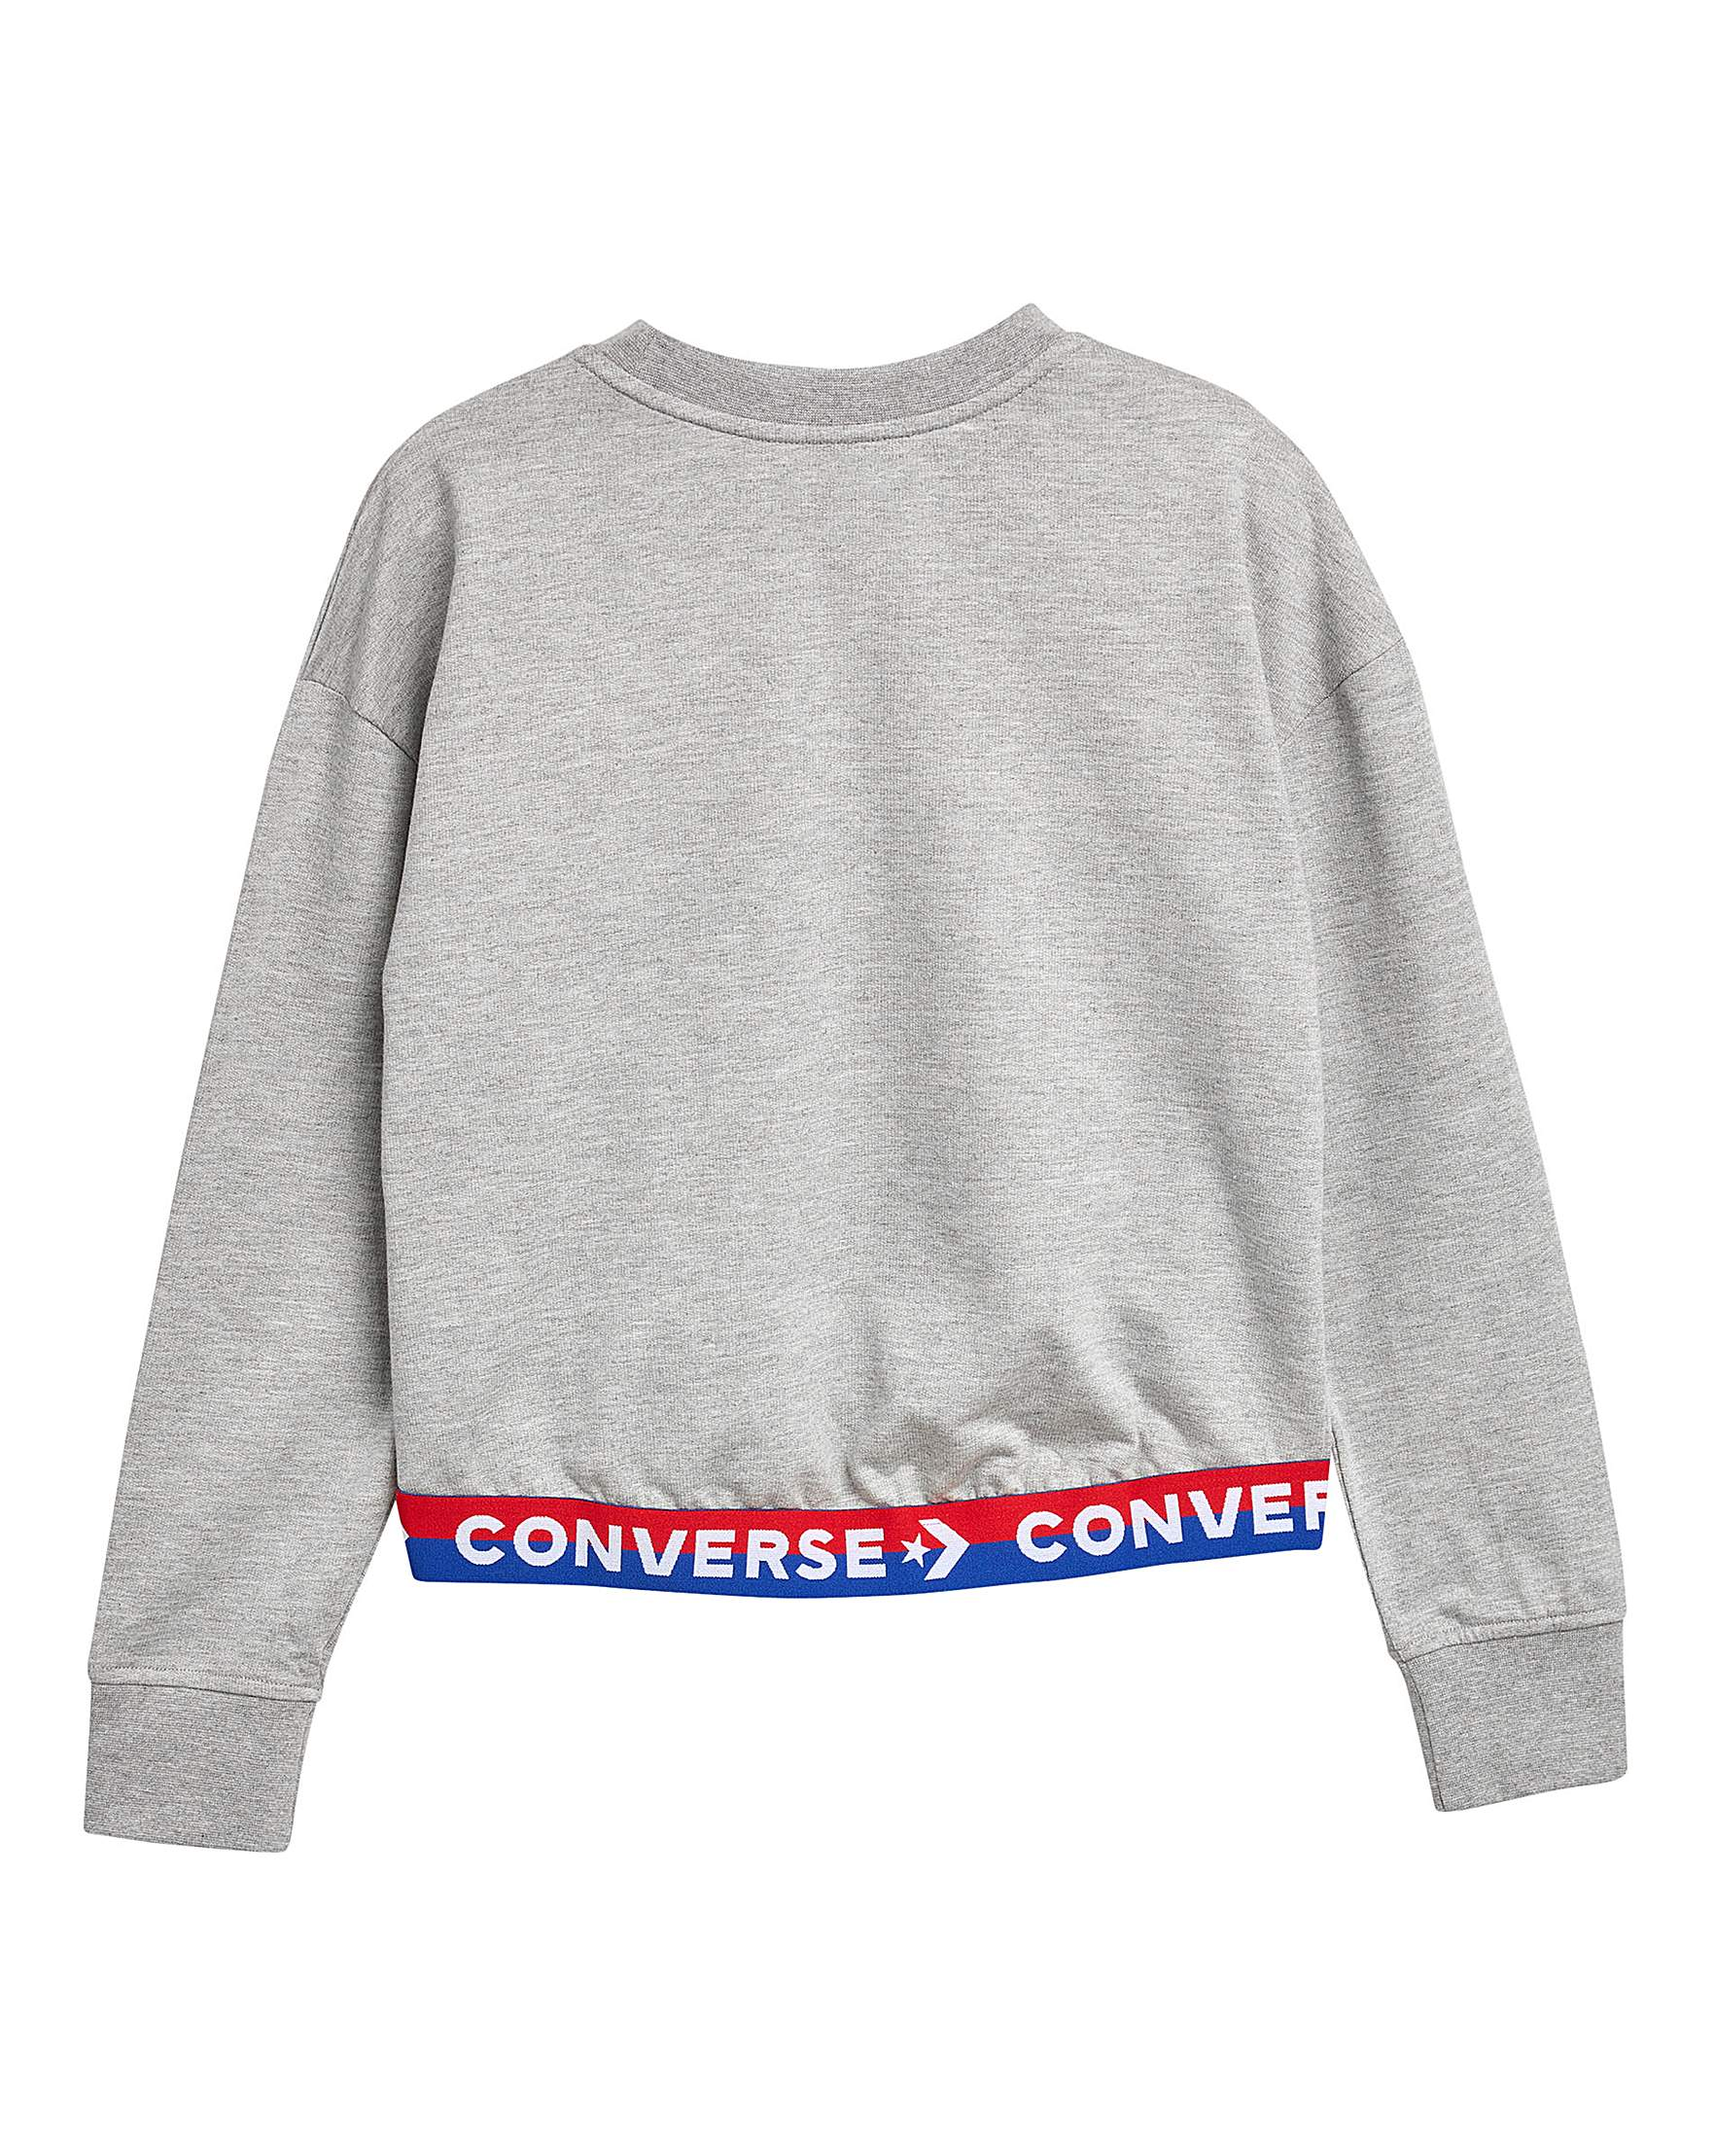 7e67747b0cee4 Converse Girls Grey Wordmark Crew Pullover